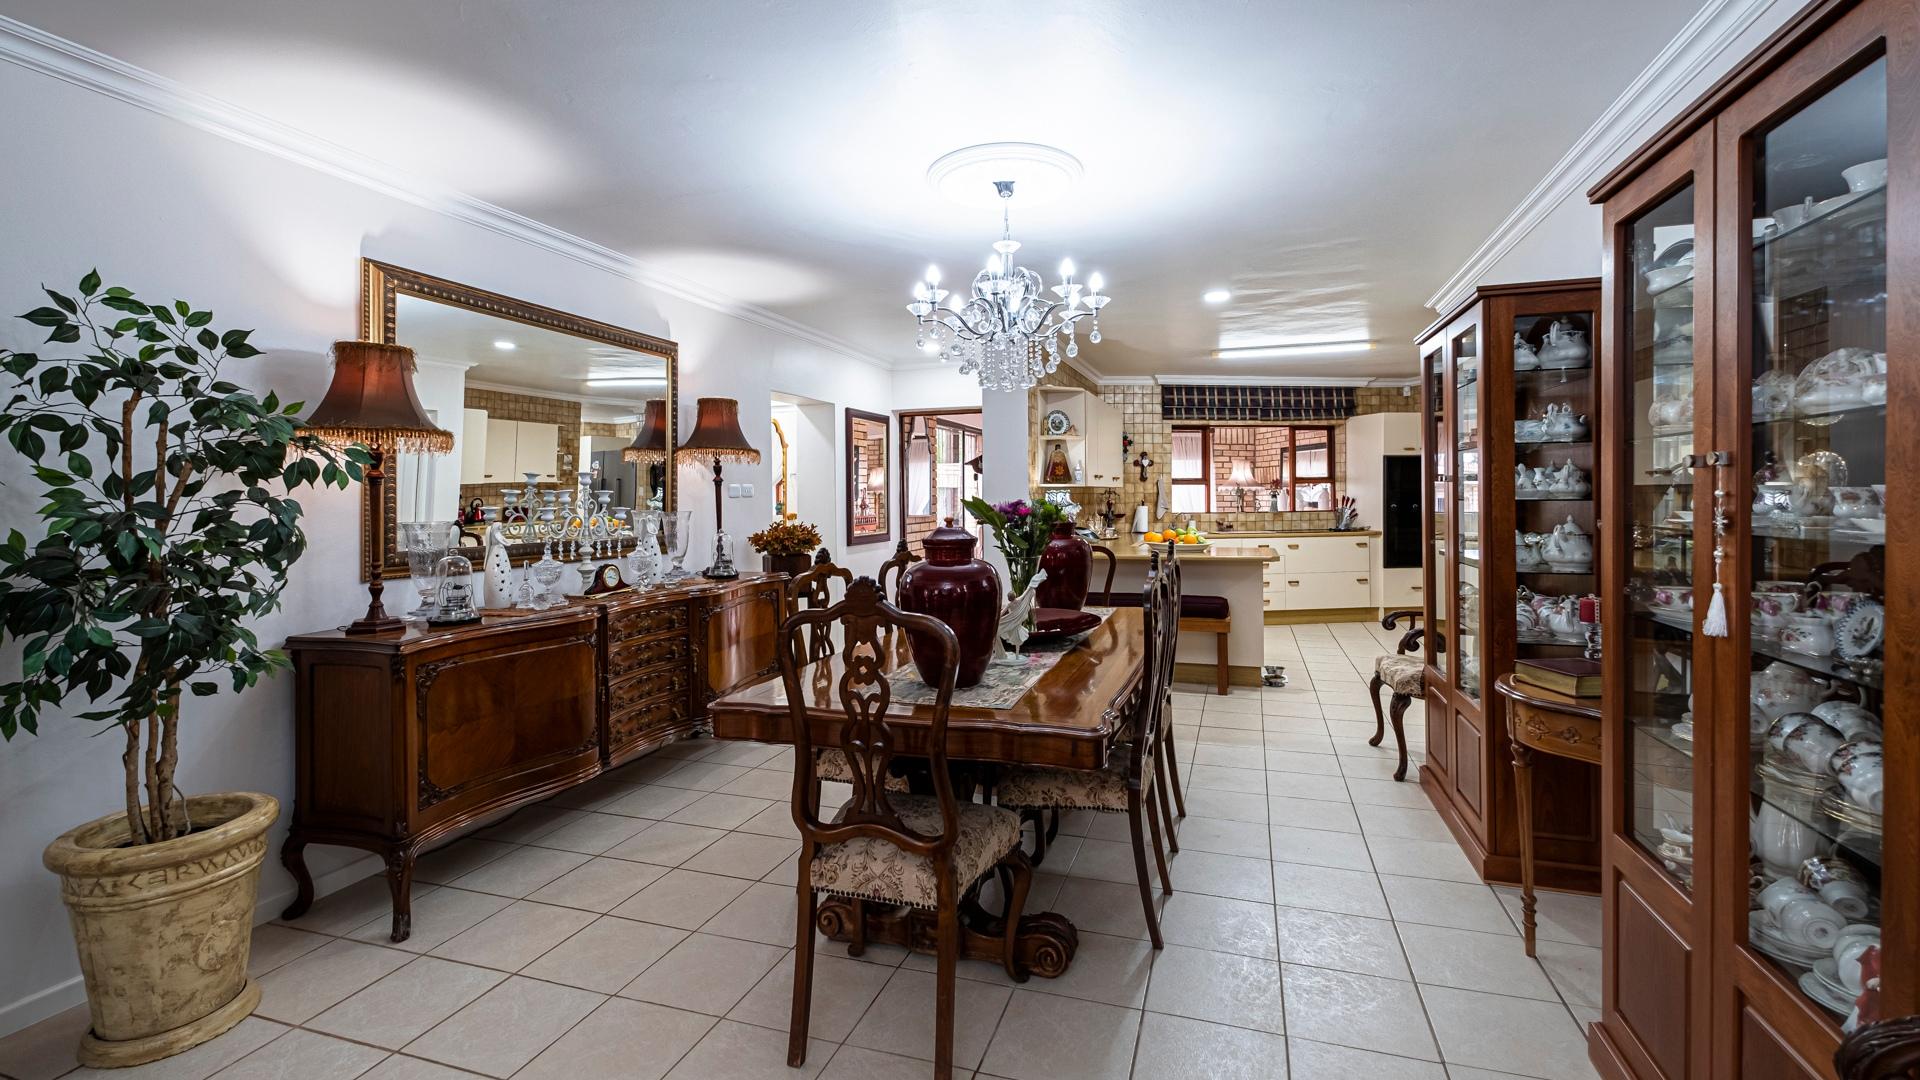 7 Bedroom House For Sale in Wavecrest